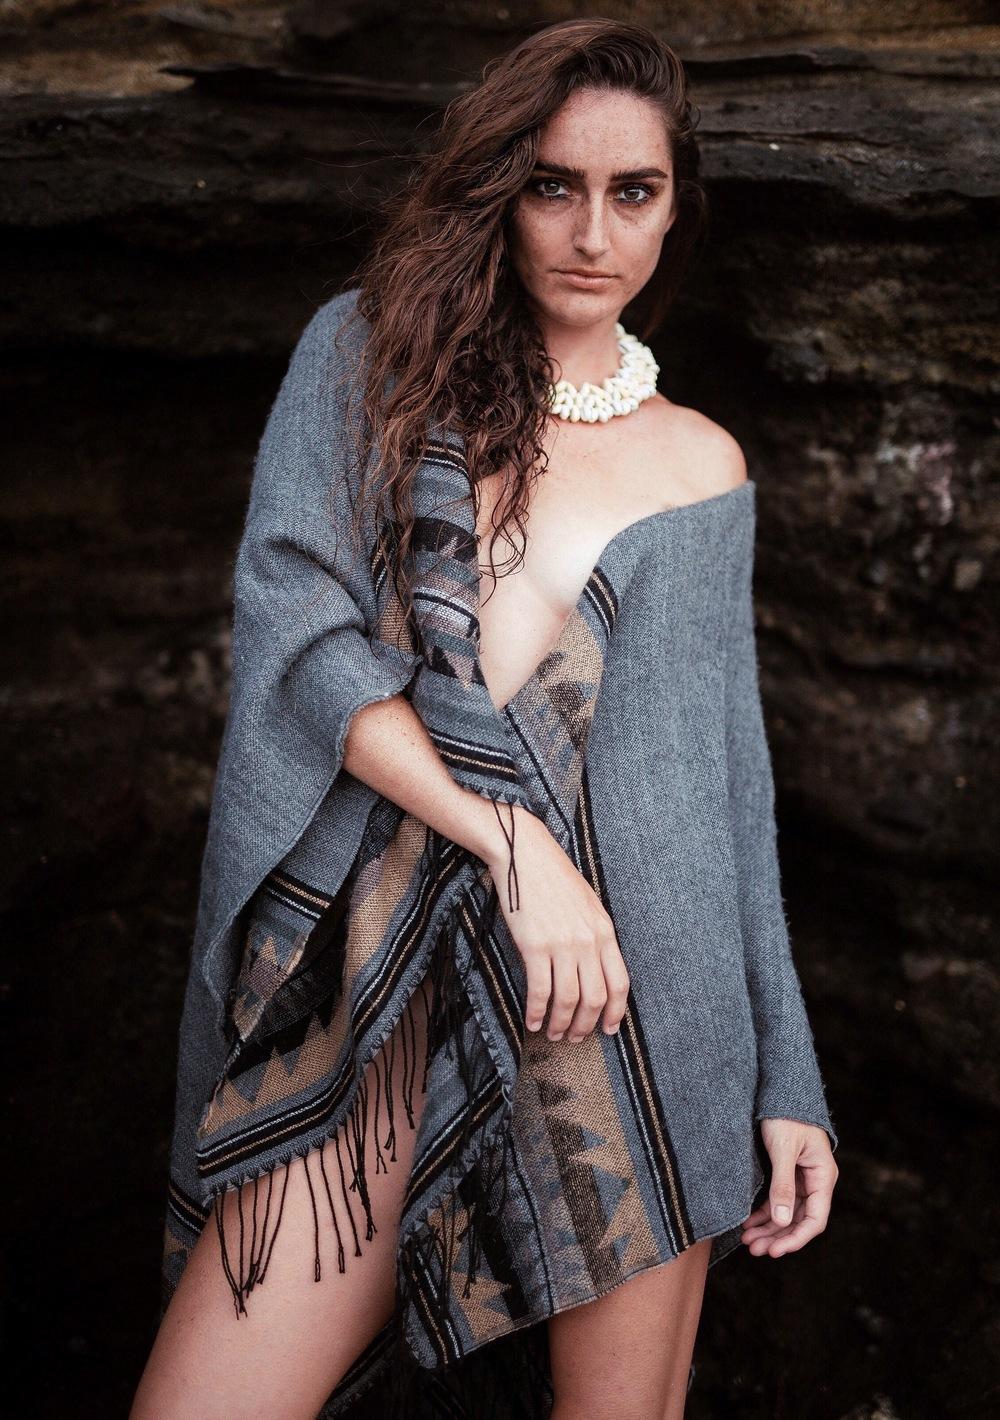 Photographer: Shaneika Aguilar  Model: Sophi Babette  Hair & Makeup: Kate Broadhurst